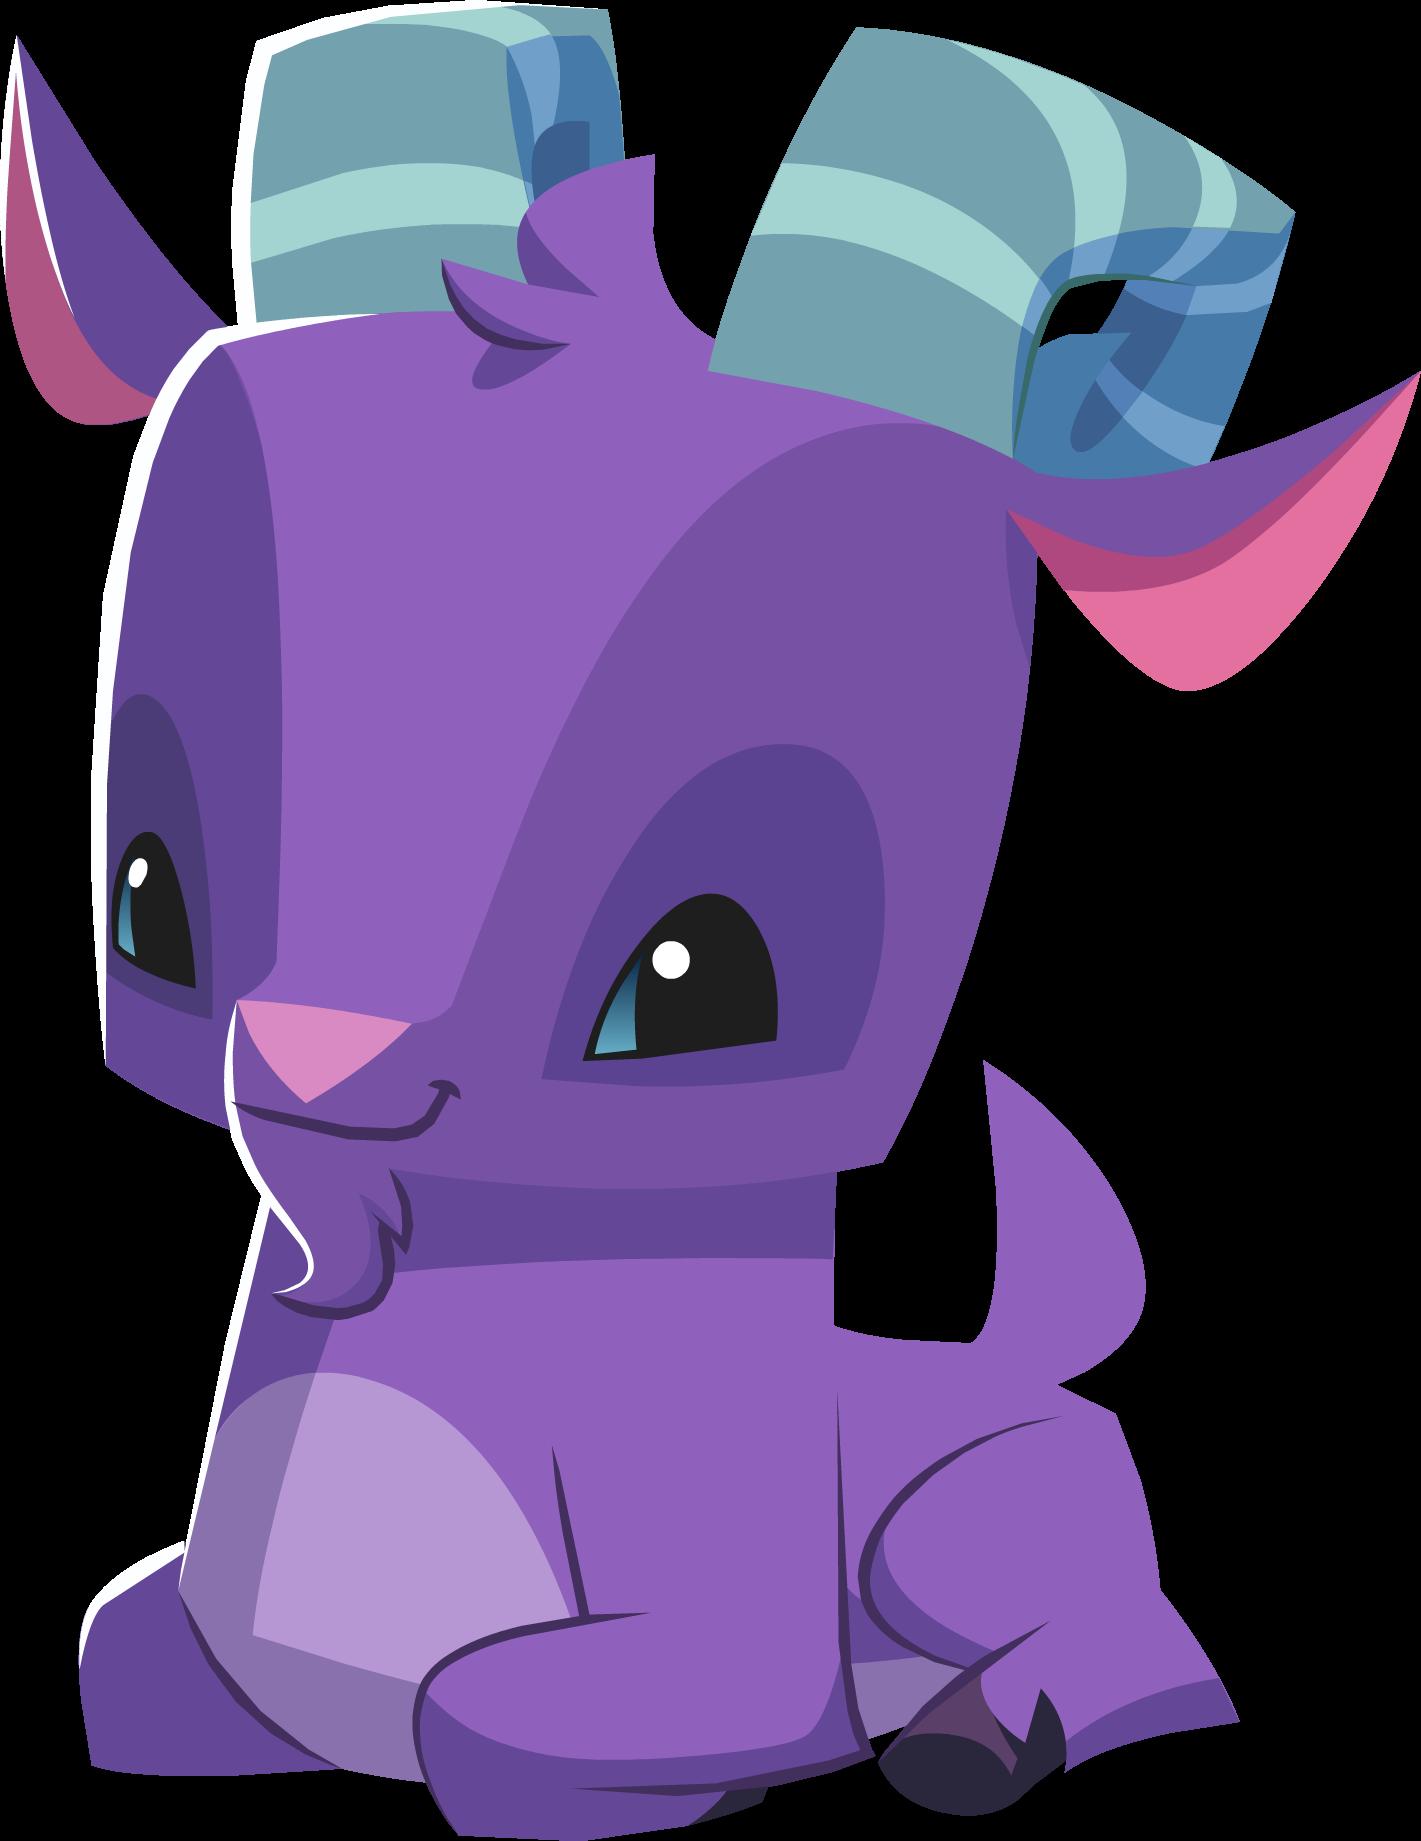 Jam clipart purple. Image goat sitting png